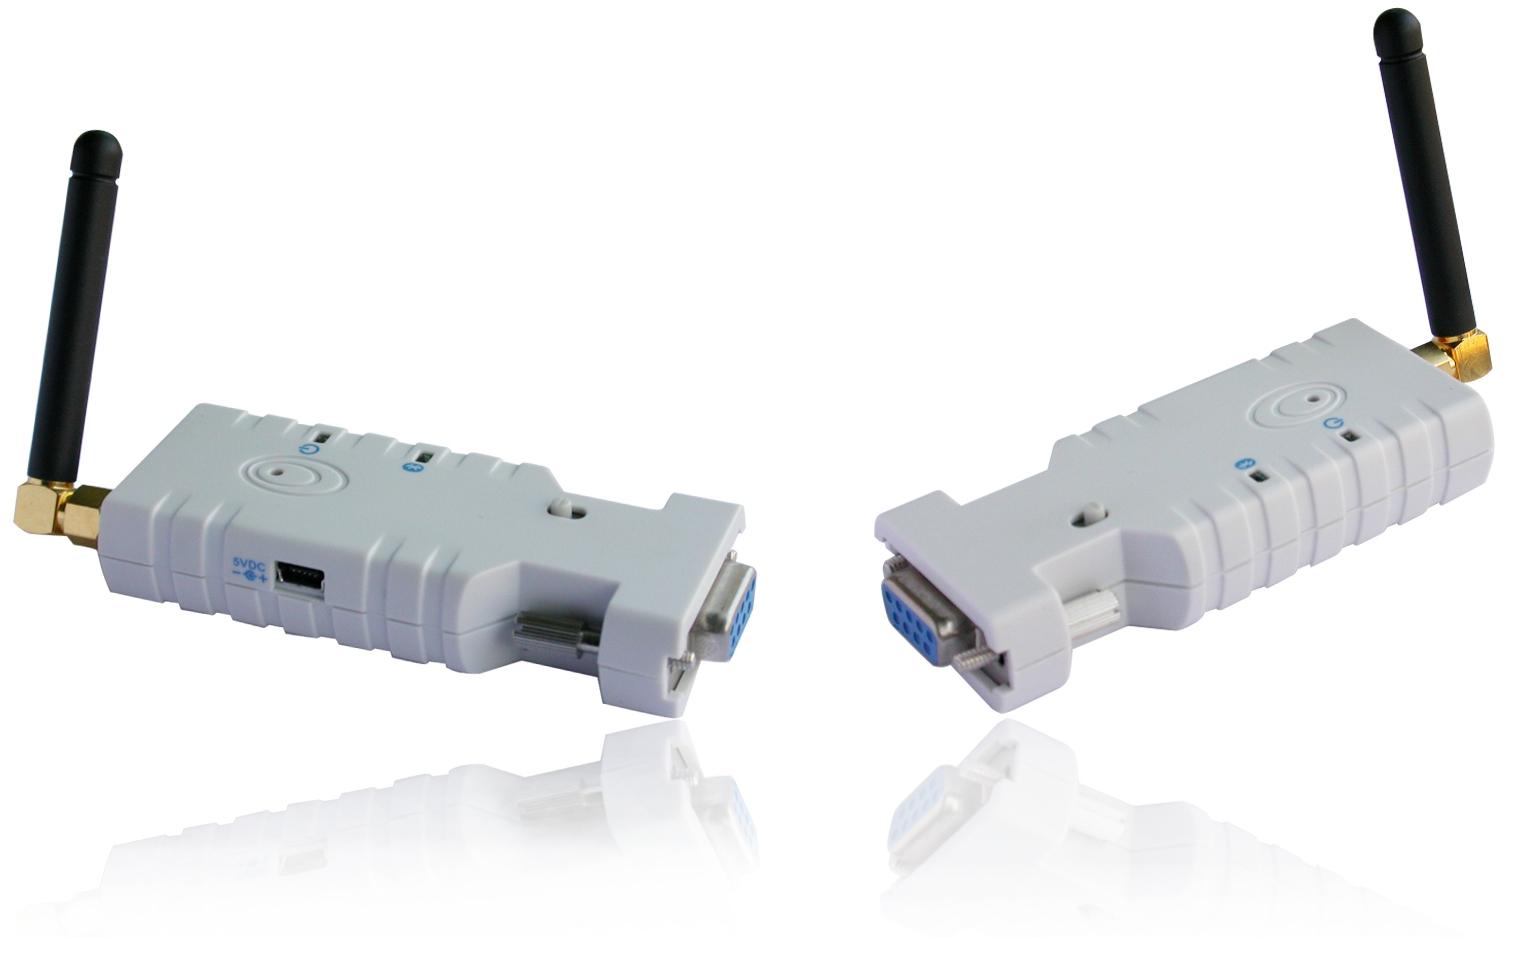 Bluetooth Wireless Serial Port Adapter